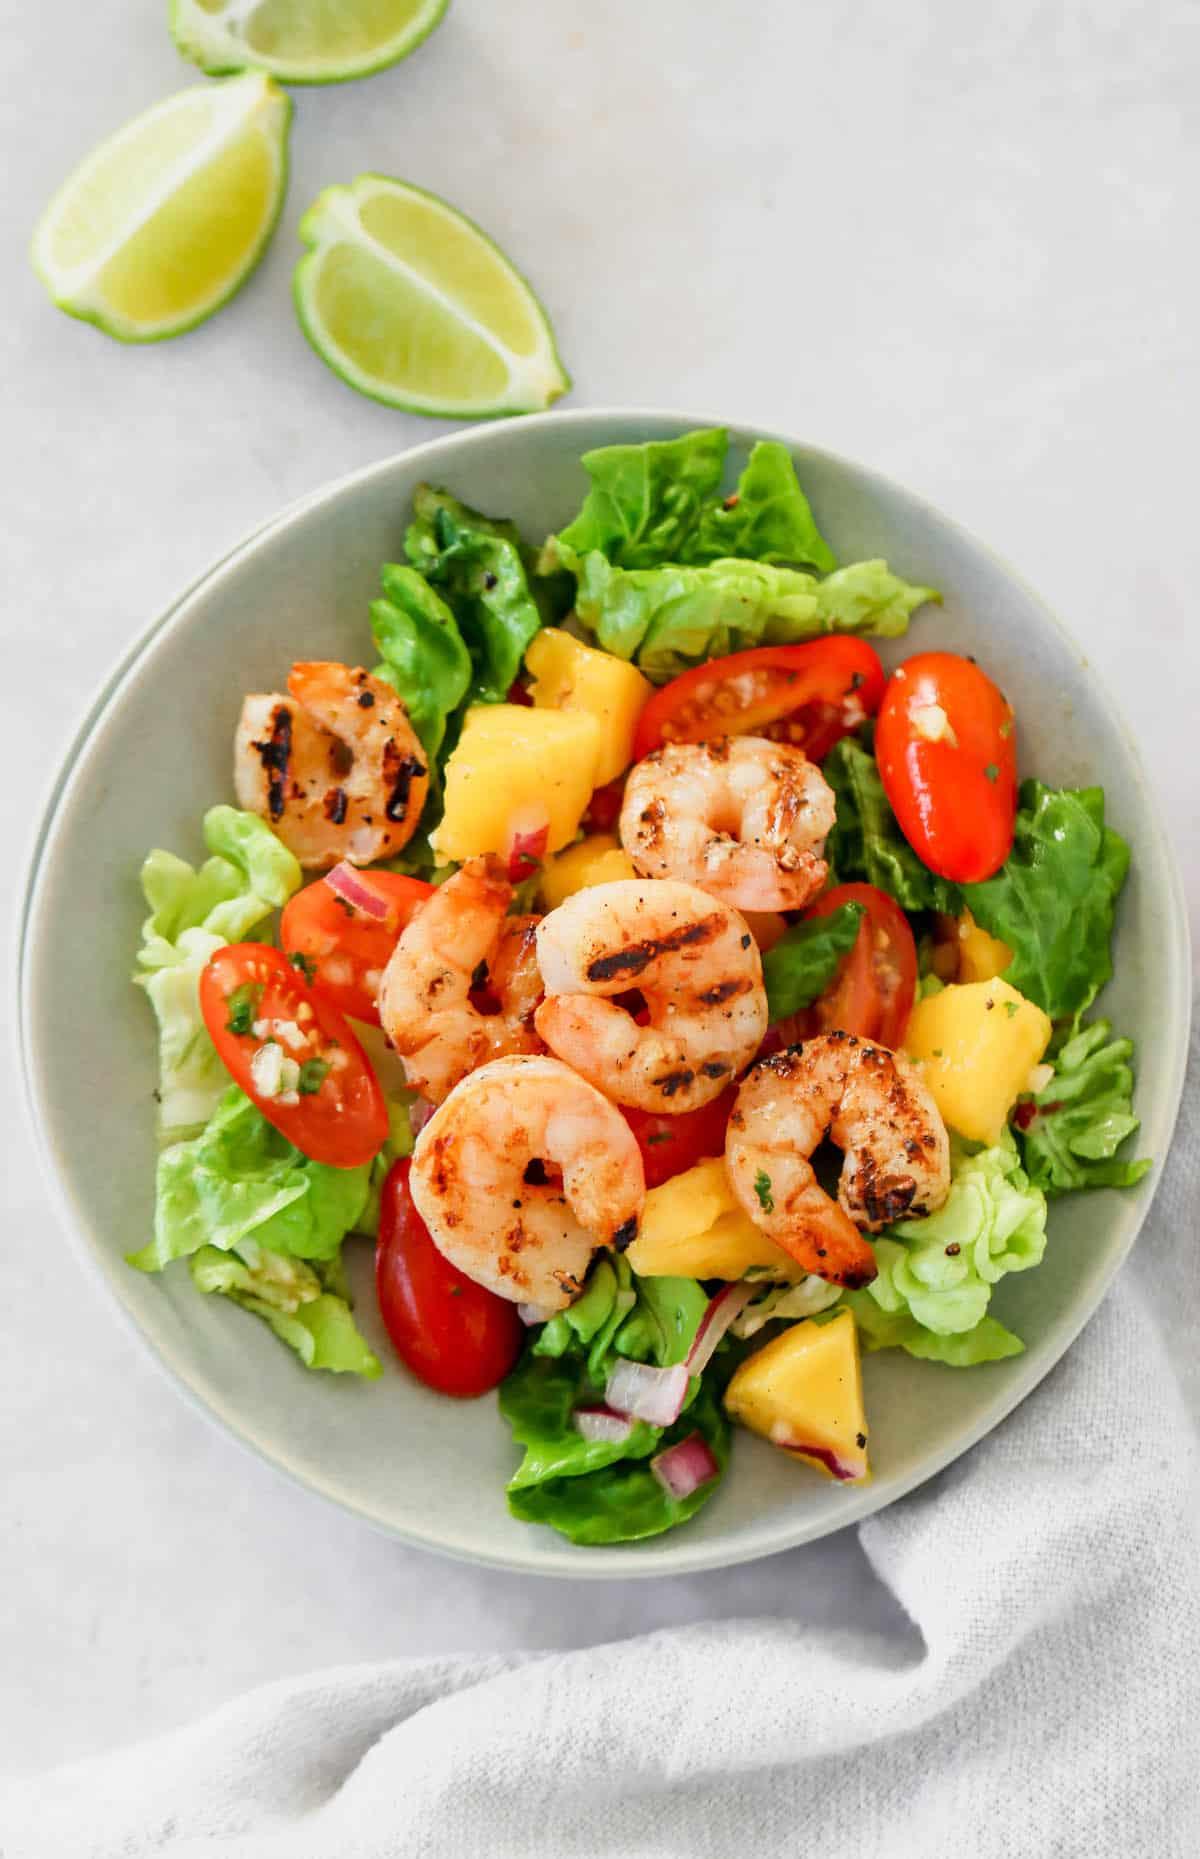 A small bowl of mango and shrimp salad